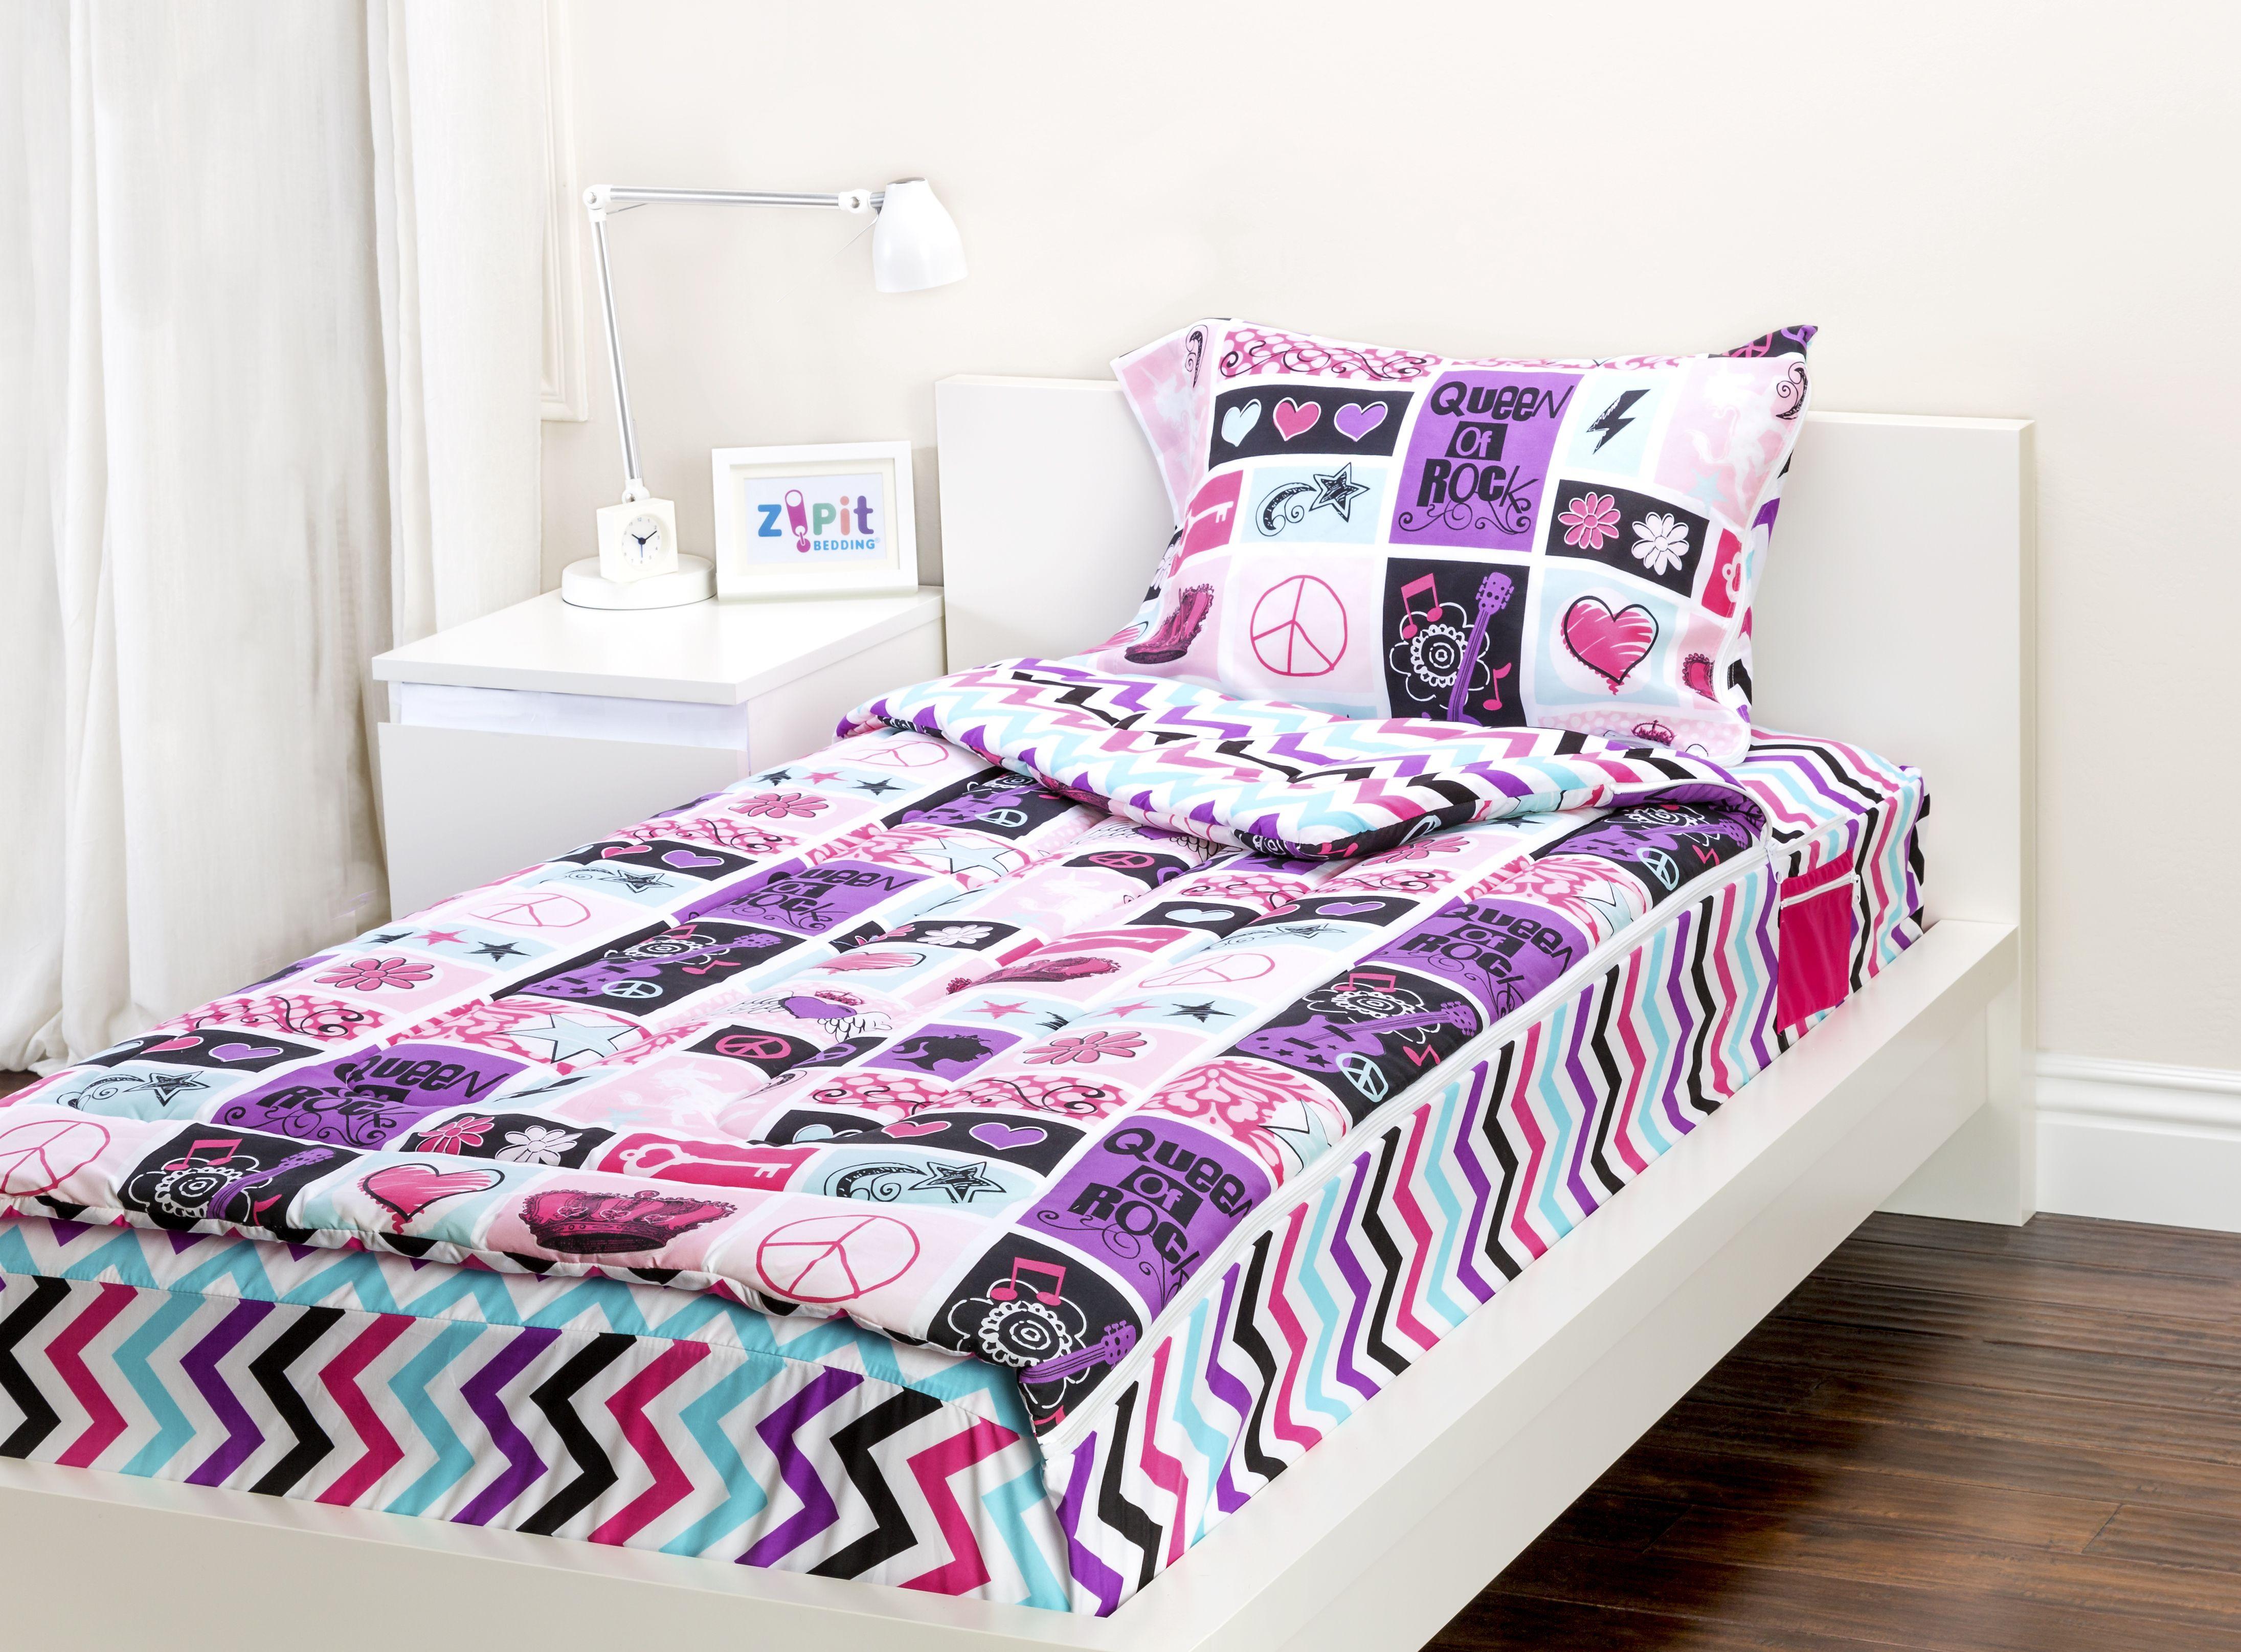 Rocker Princess Zipit Bedding Set. Zipit Bedding is